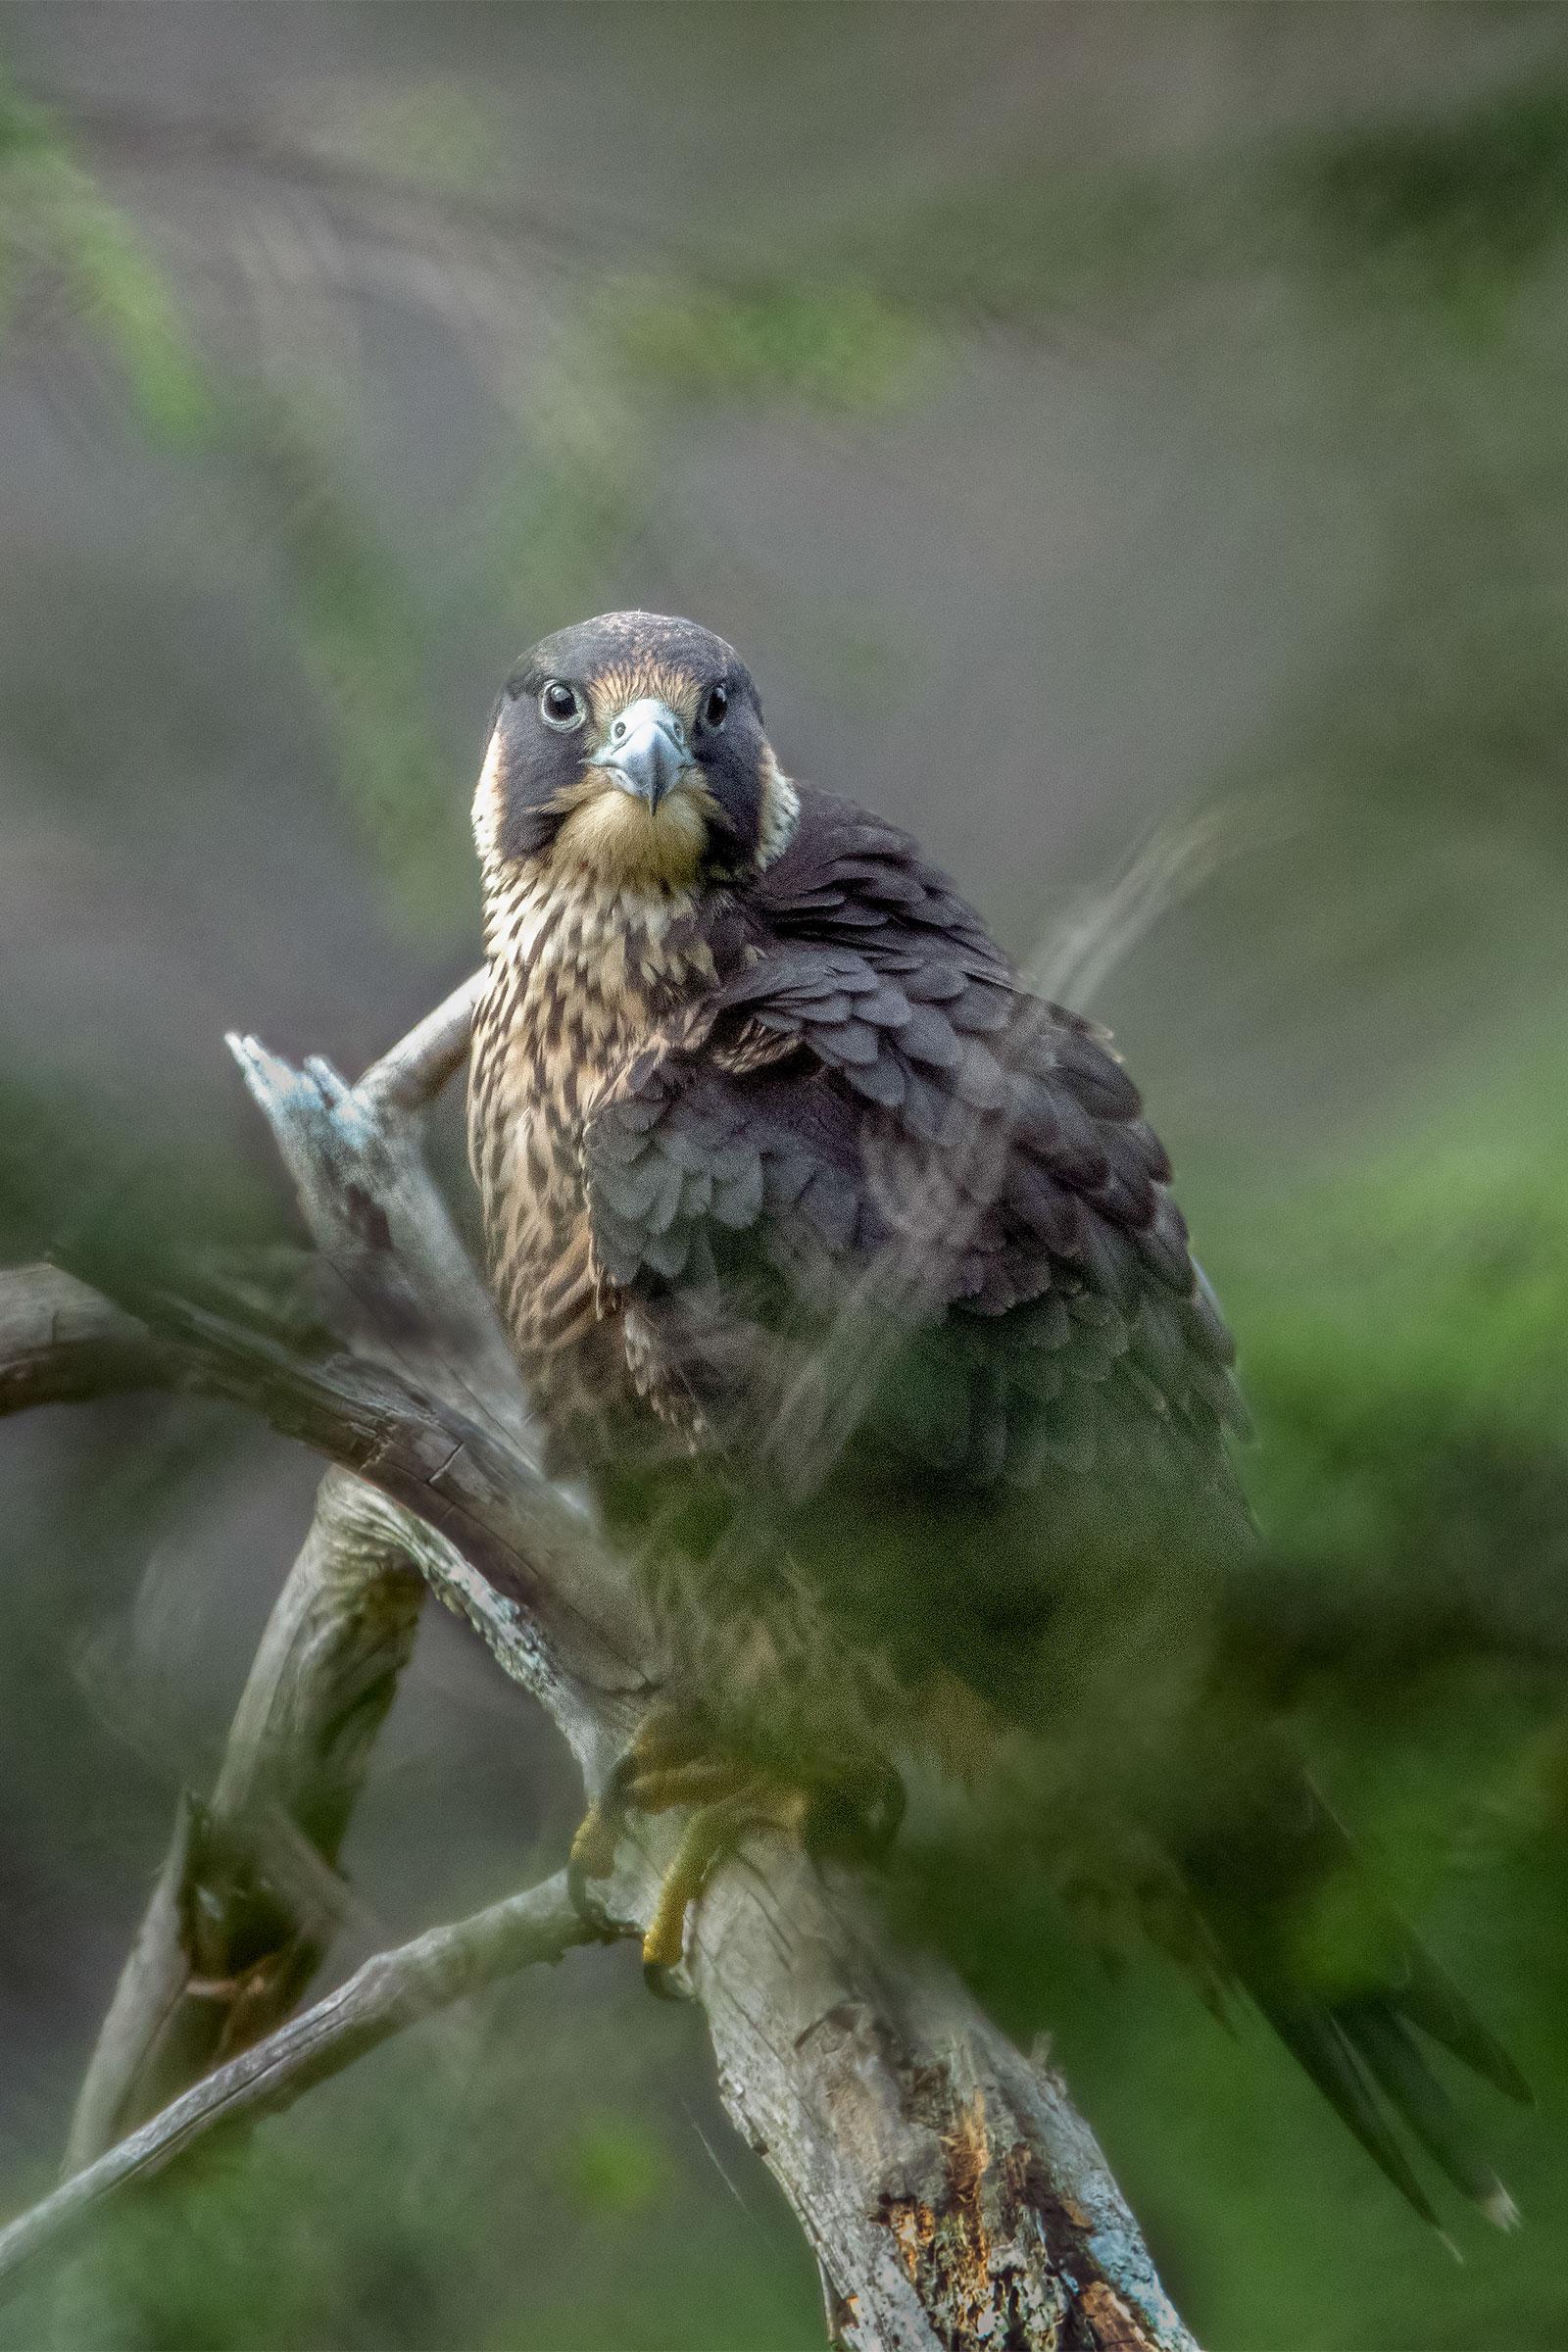 Juvenile Peregrine Falcon at Taughannock Falls, July 2020. Melissa Groo